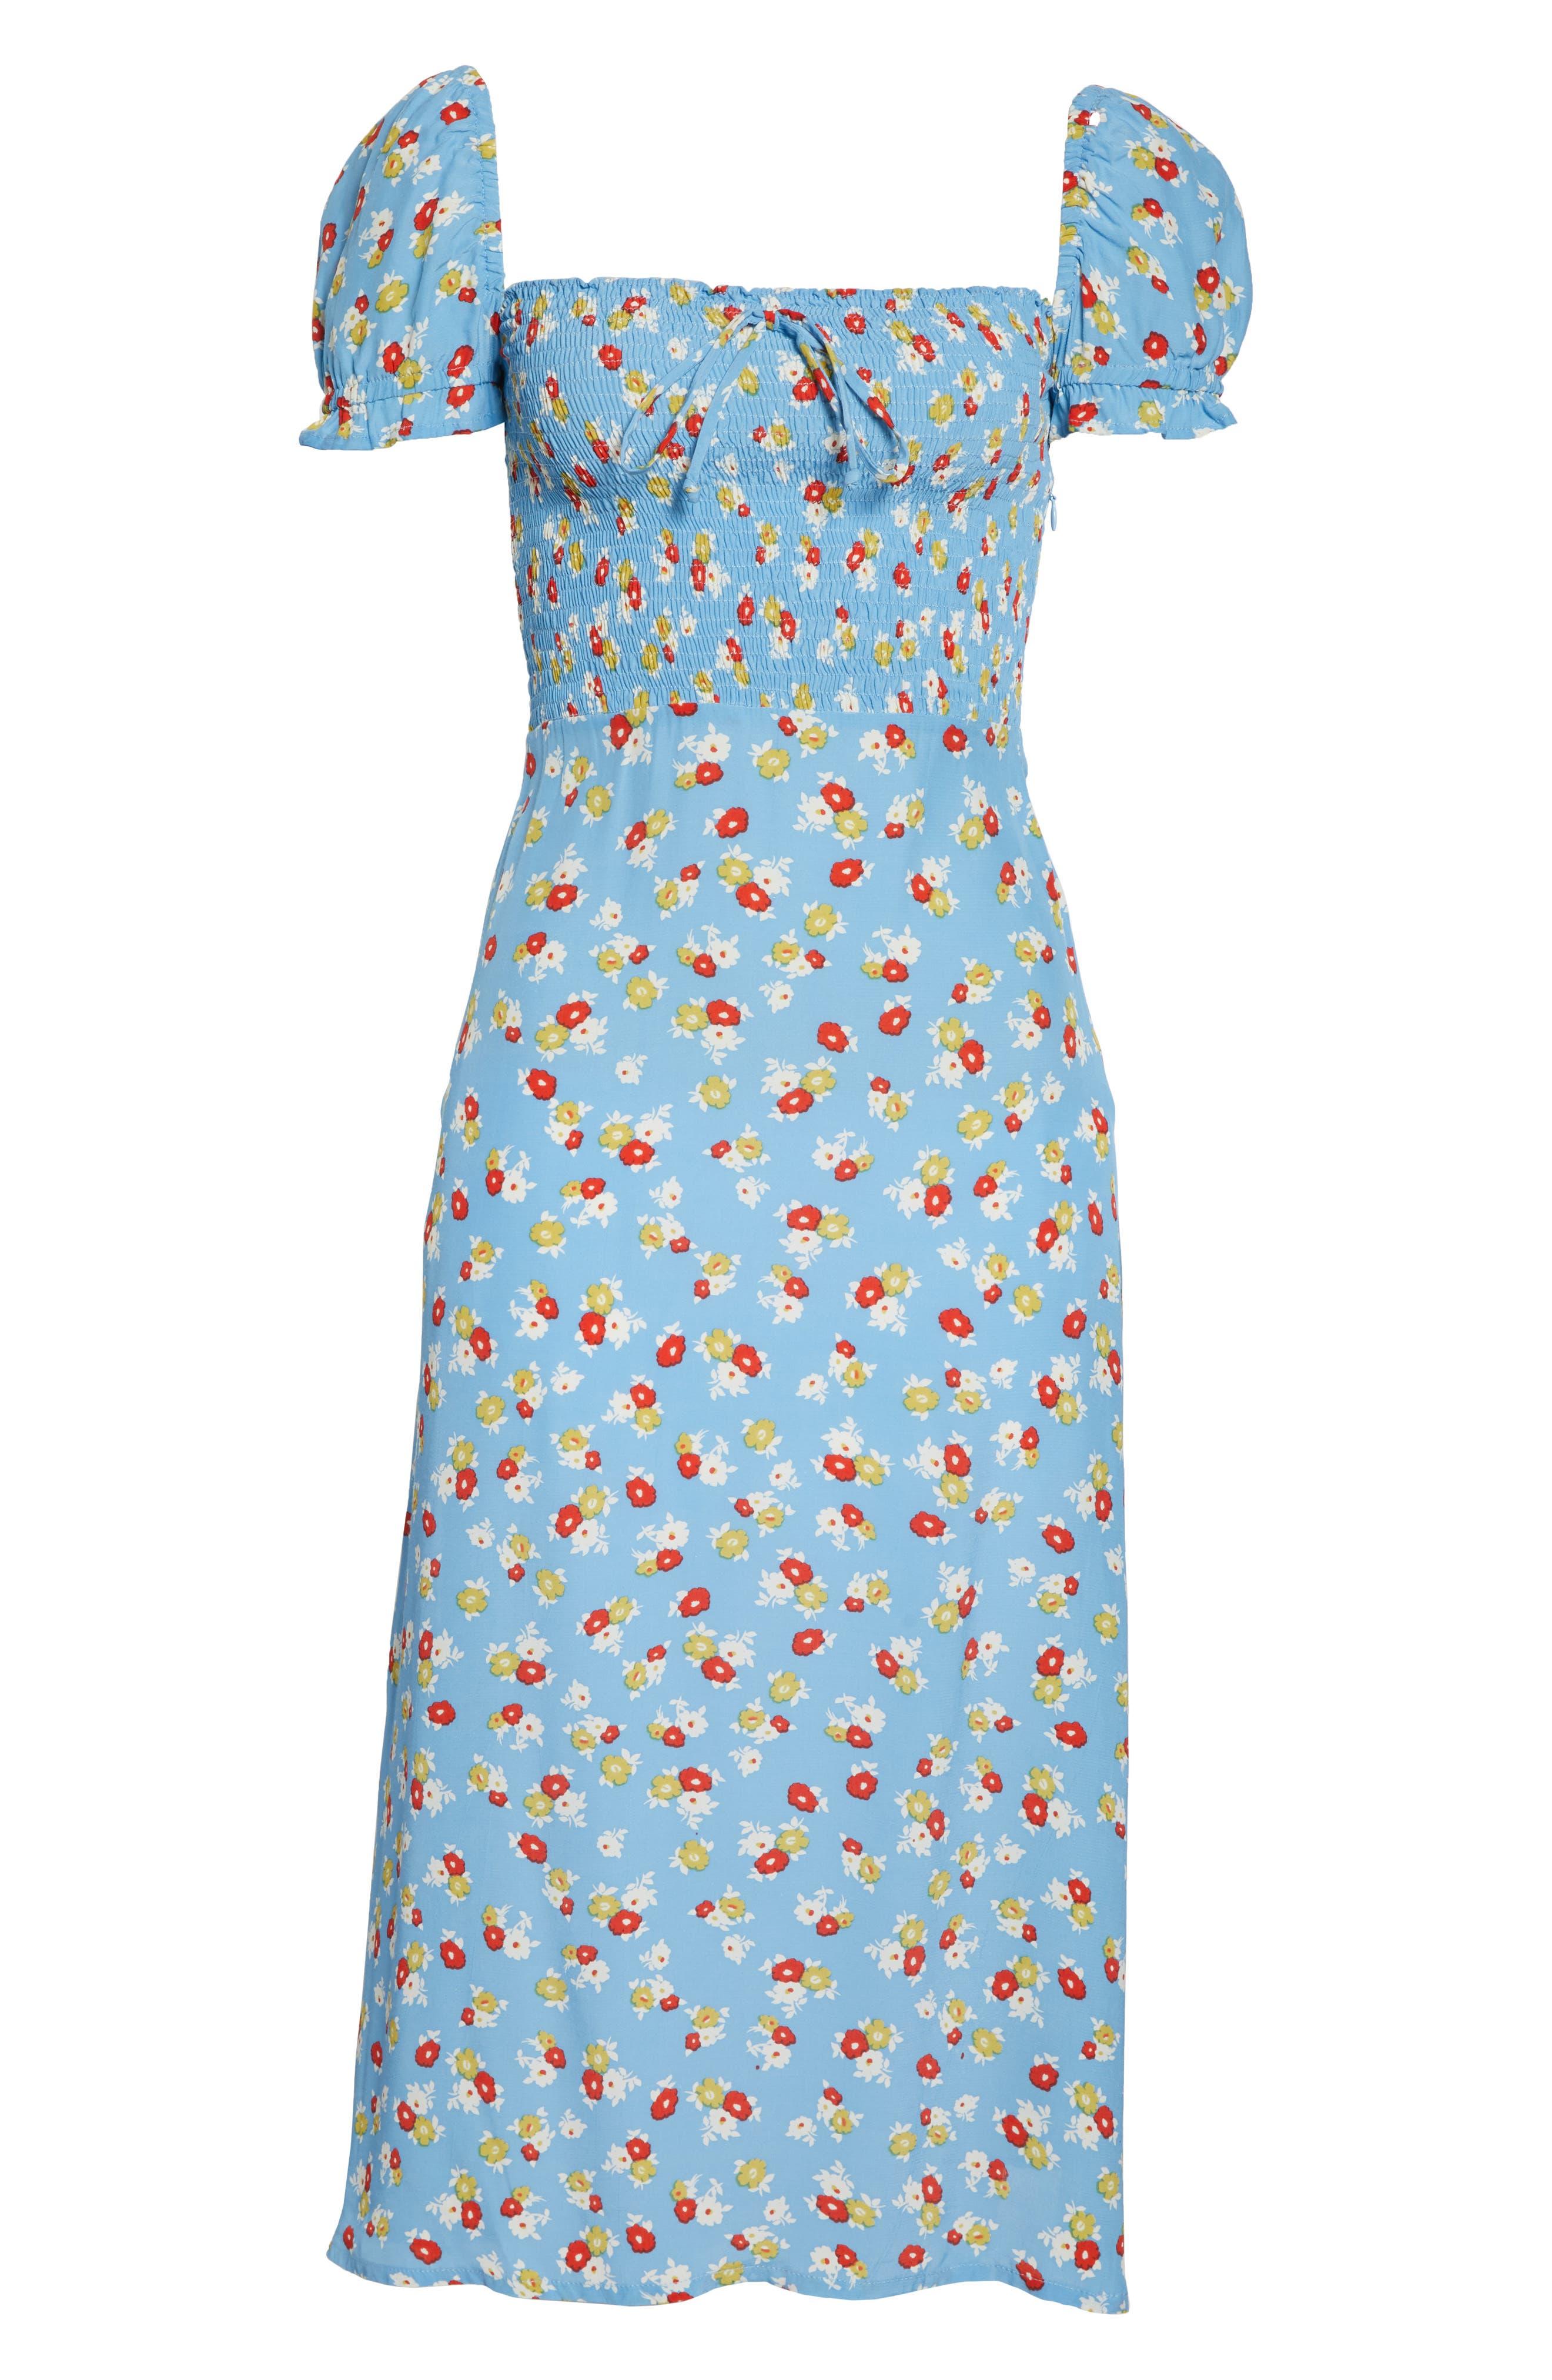 FAITHFULL THE BRAND, Castilo Jasmin Midi Dress, Alternate thumbnail 7, color, JASMIN FLORAL PRINT - BLUE